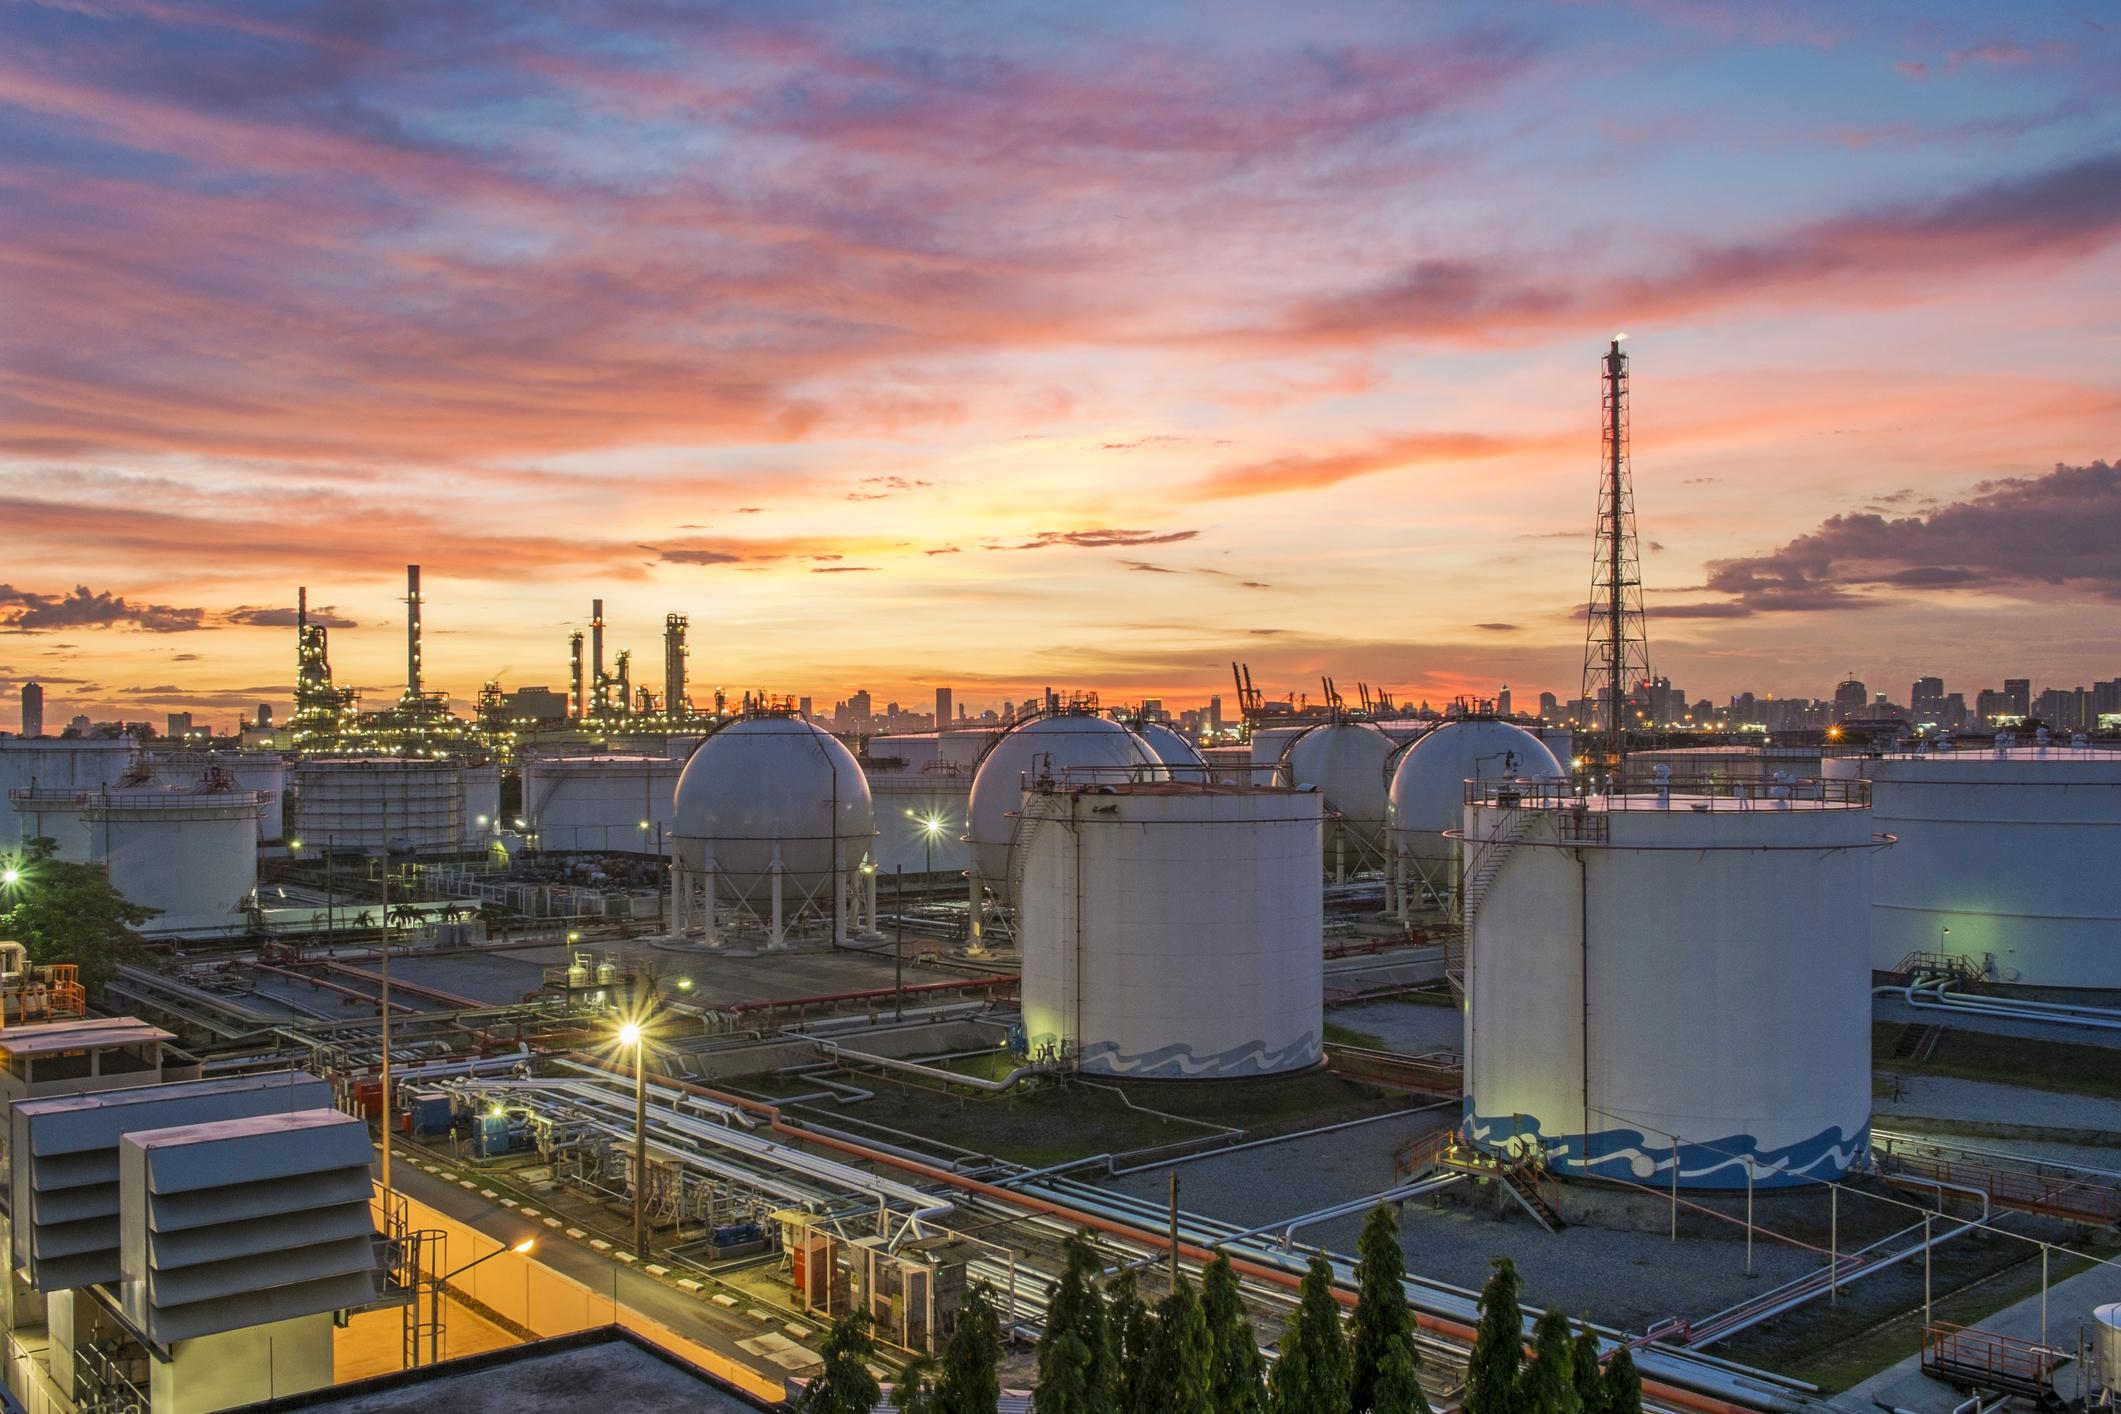 A refinery under a twilight sky.